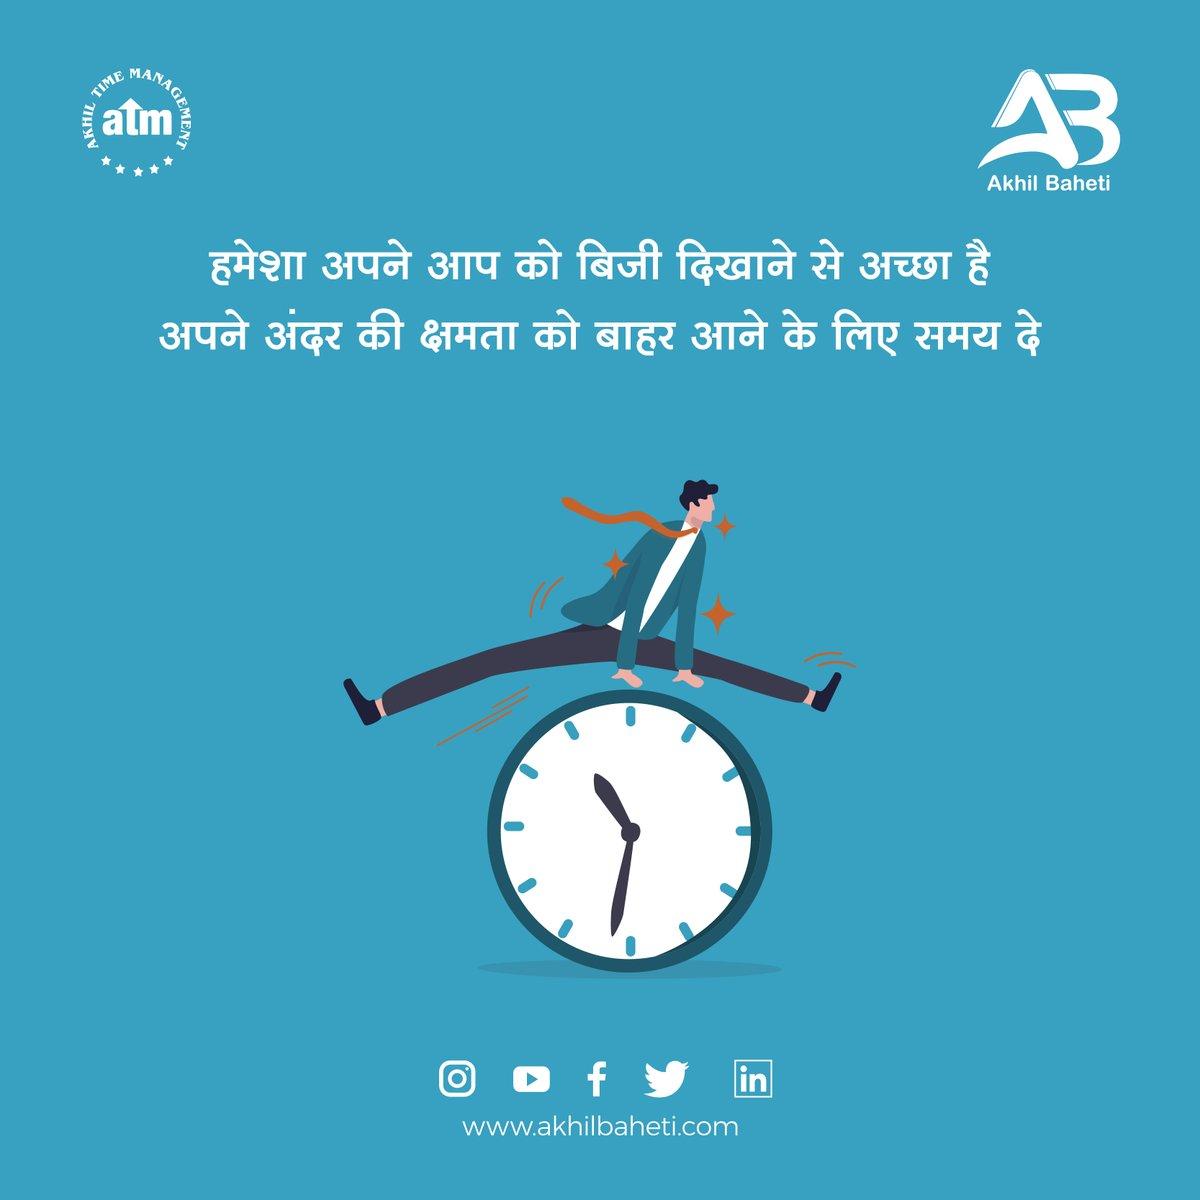 #selfimprovementdaily #akhilbaheti #moveon #timemanagement #goalsetting2021 #goalsetting #ATM #procasting #success #planning #growth #achieving #freedom #selfcontrol #smile #schedule